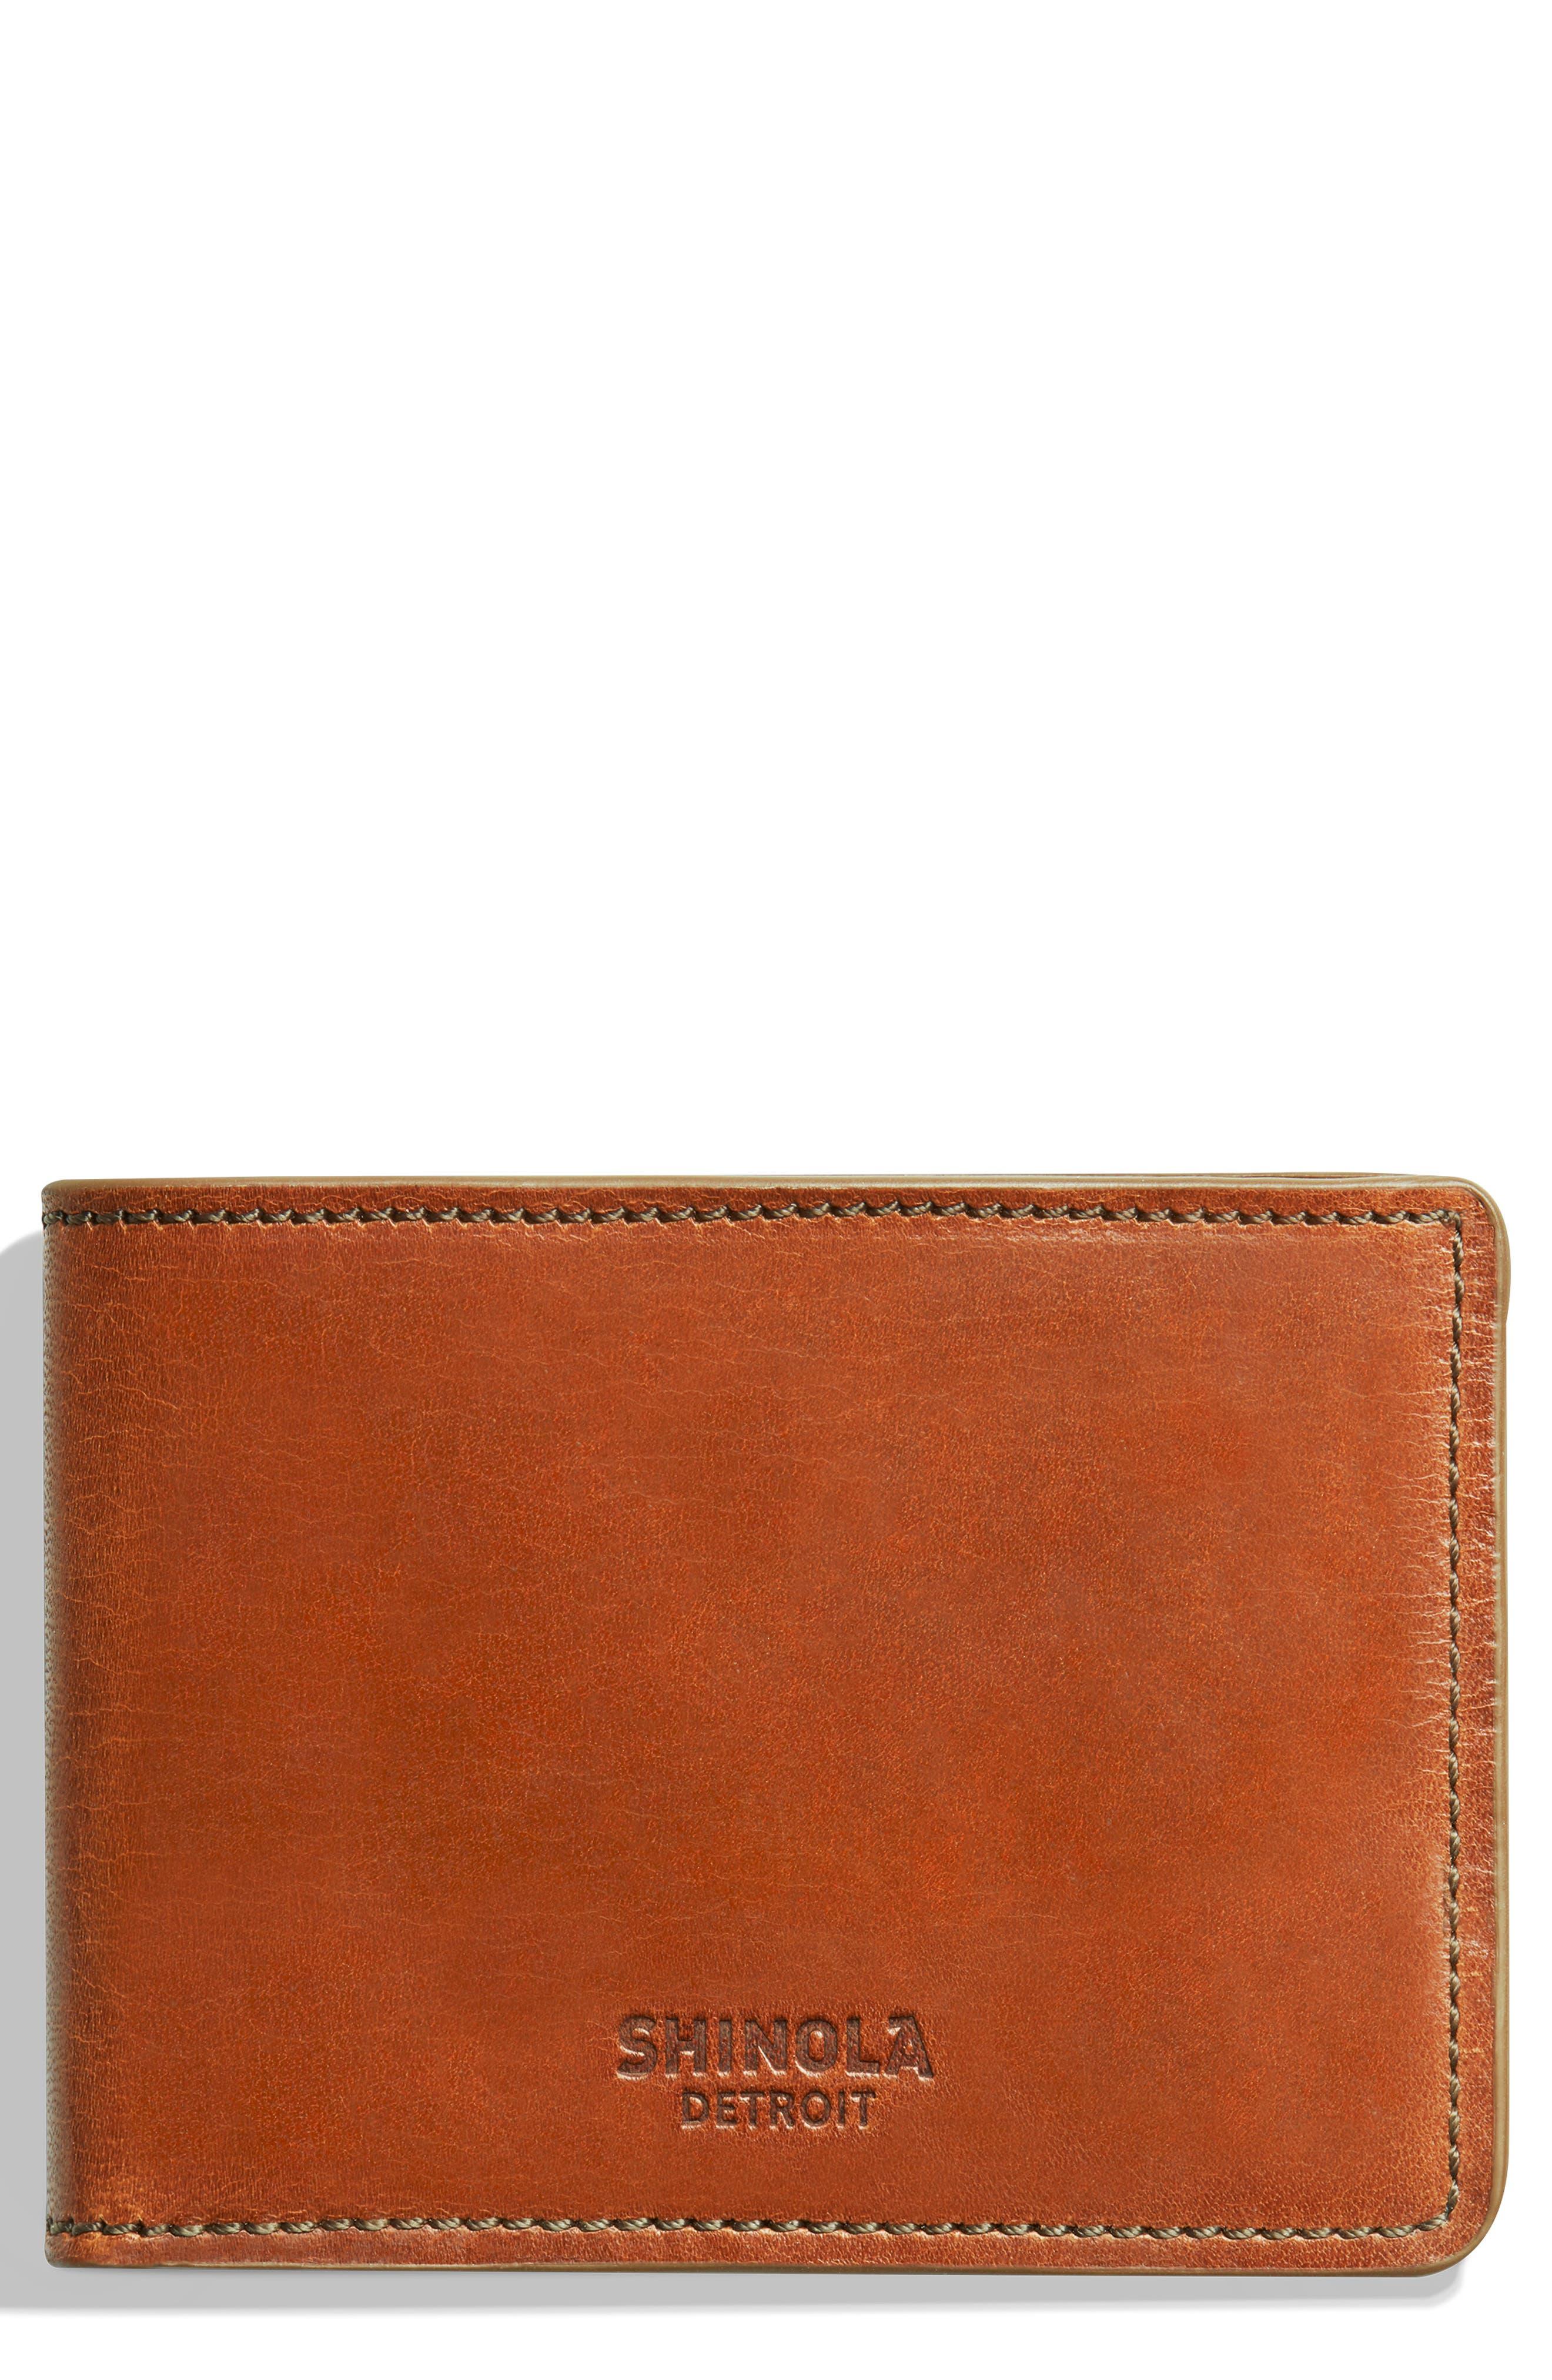 Harness Slim 2.0 Bifold Leather Wallet,                             Main thumbnail 1, color,                             BOURBON